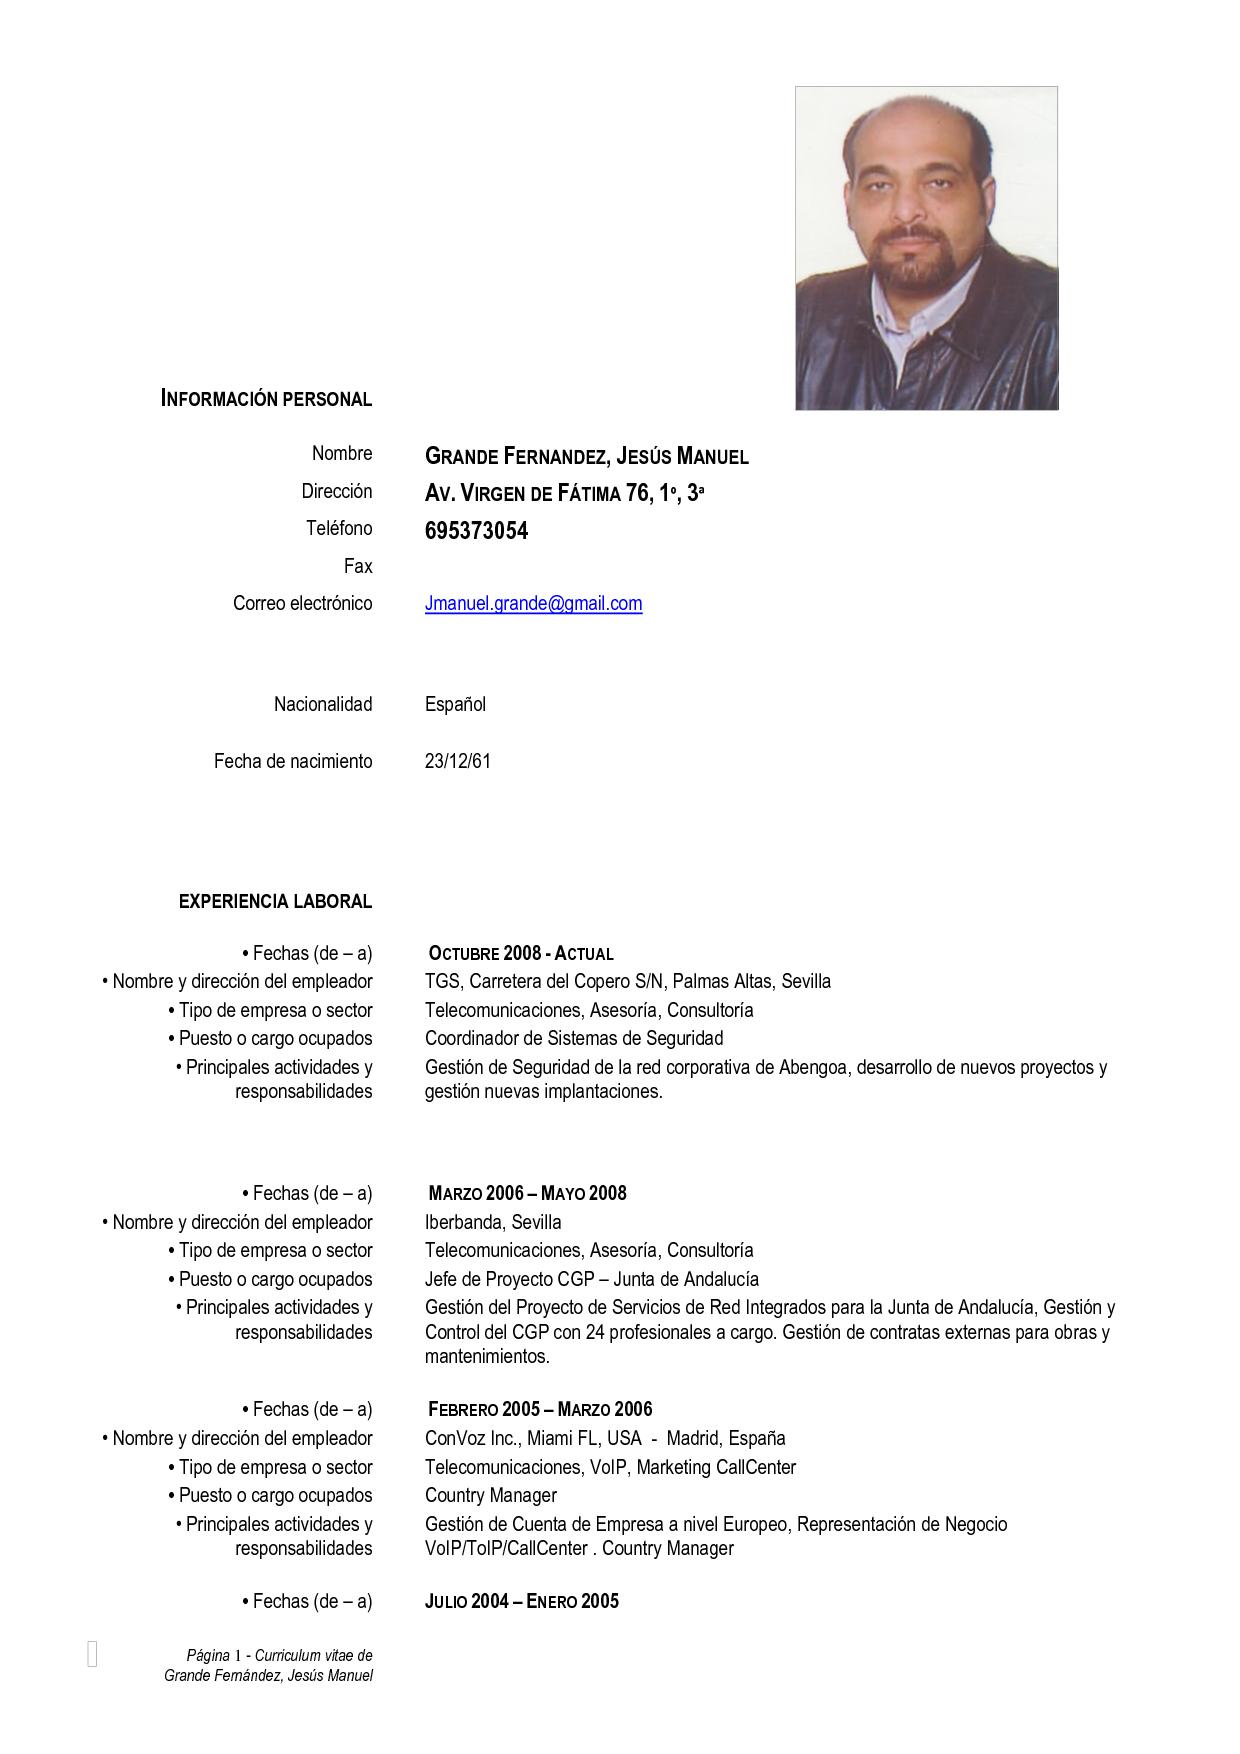 Curriculum vitae modelo empresarial